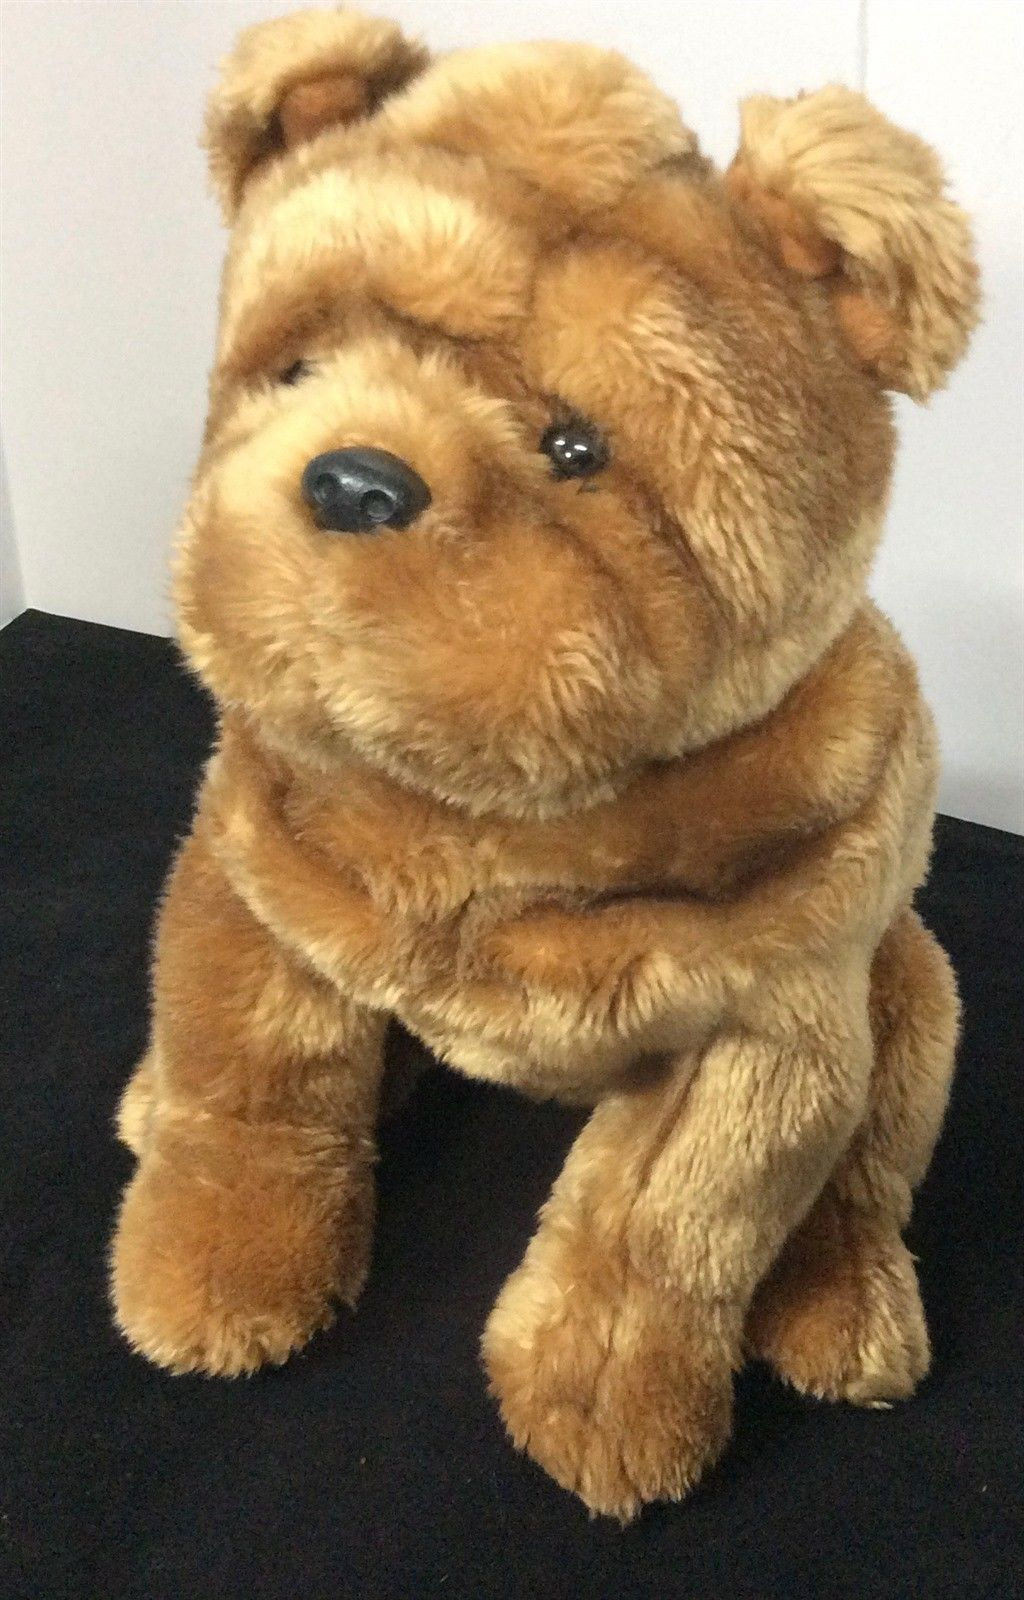 Ty Beanie Buddies Bull Dog Wrinkles Plush Buddy Puppy 2004 Stuffed Animal Doll